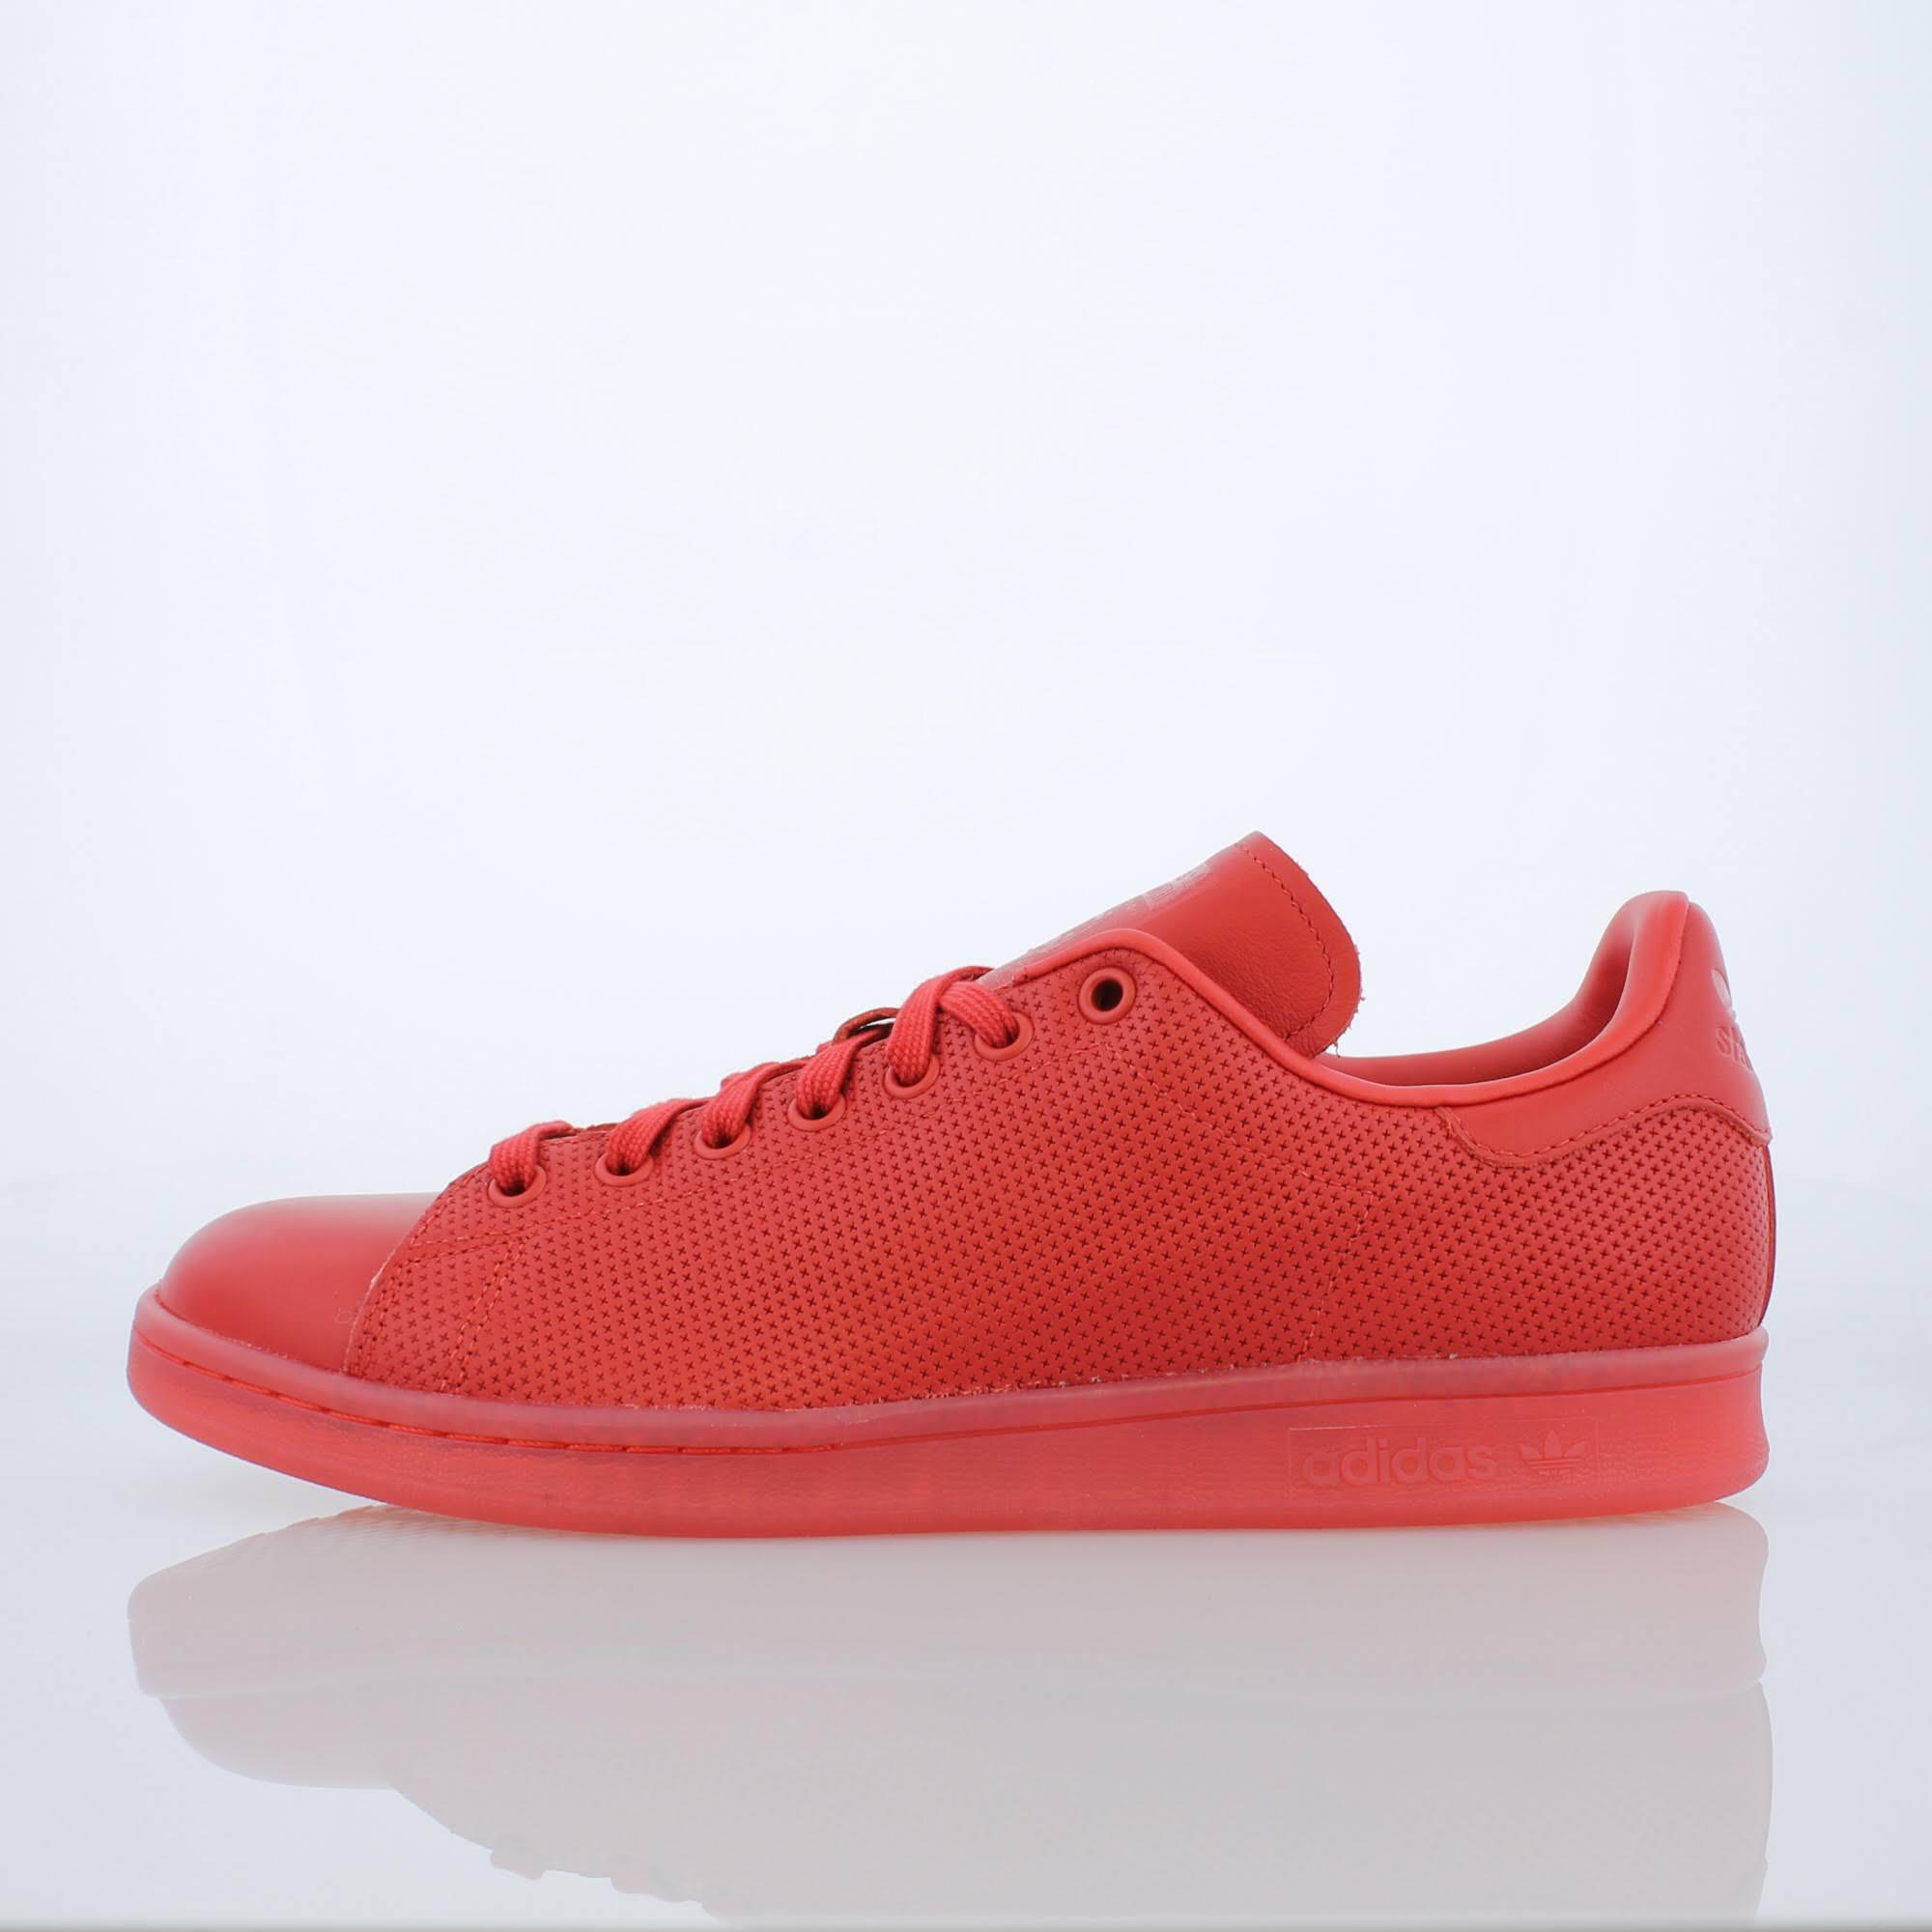 Mens Smith Adicolor Ecarla S80248 Style Adidas Scarle 10 Stan awTqgTt